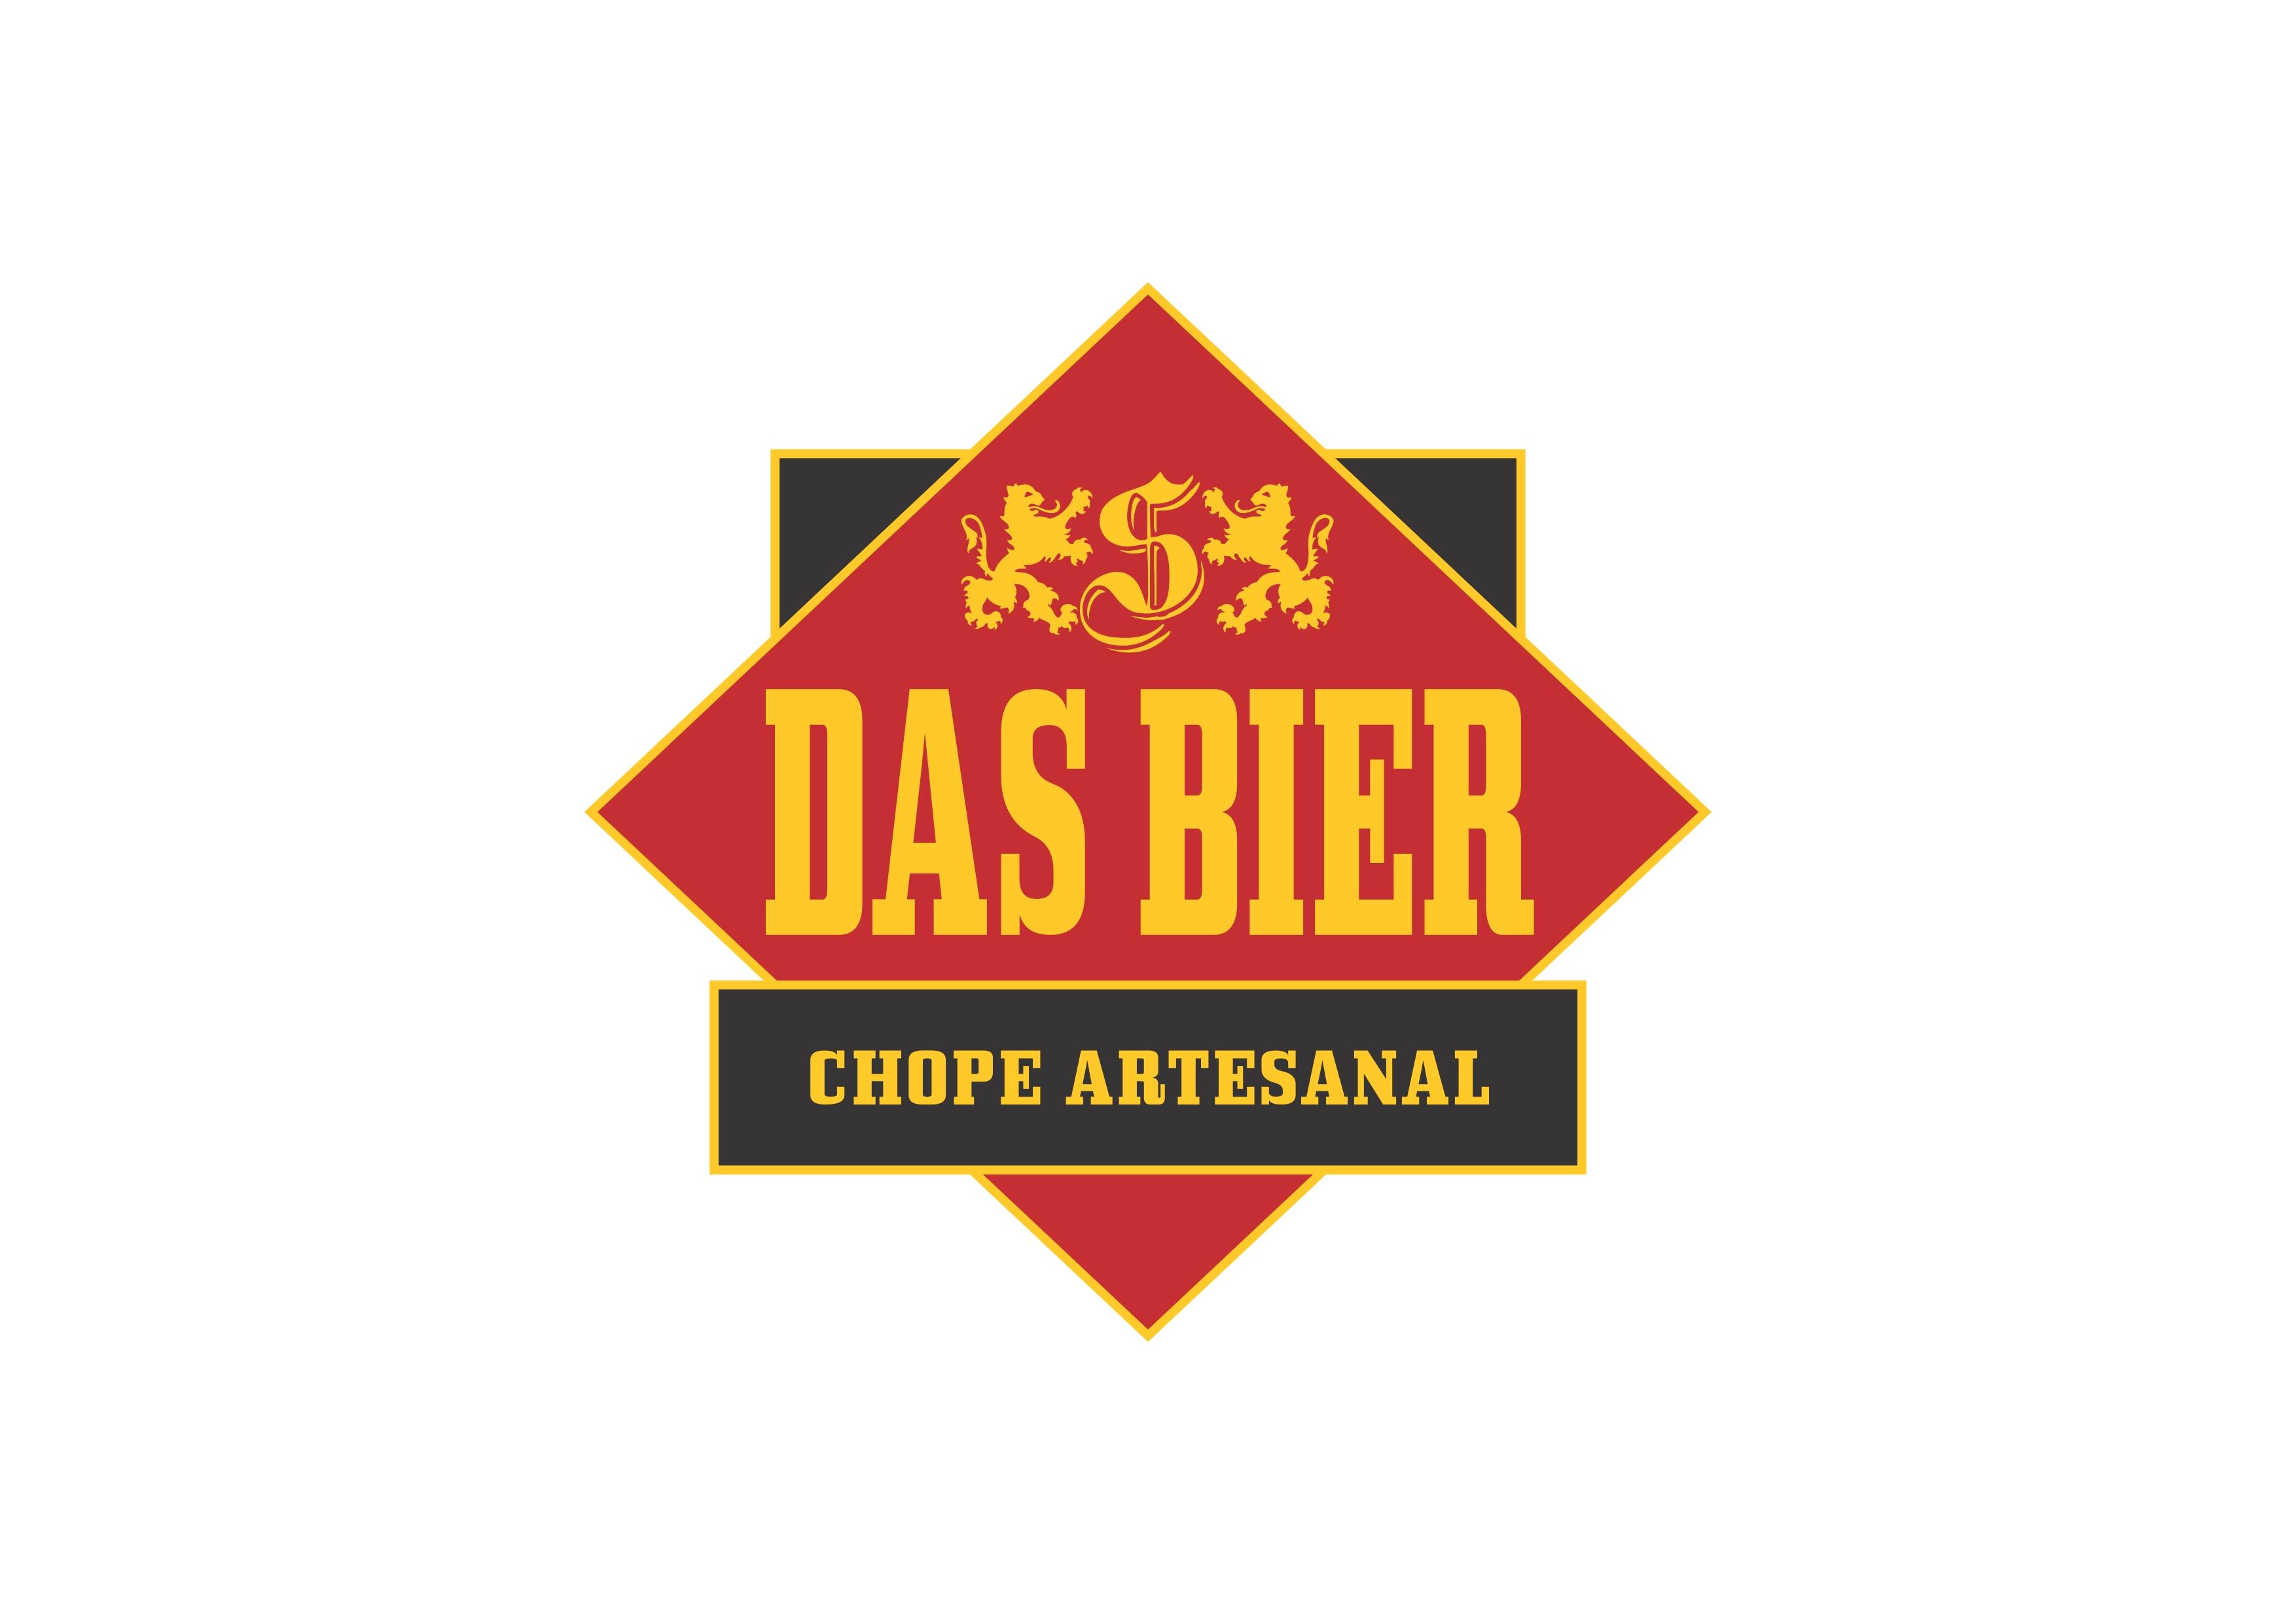 Das Bier Chope Artesanal